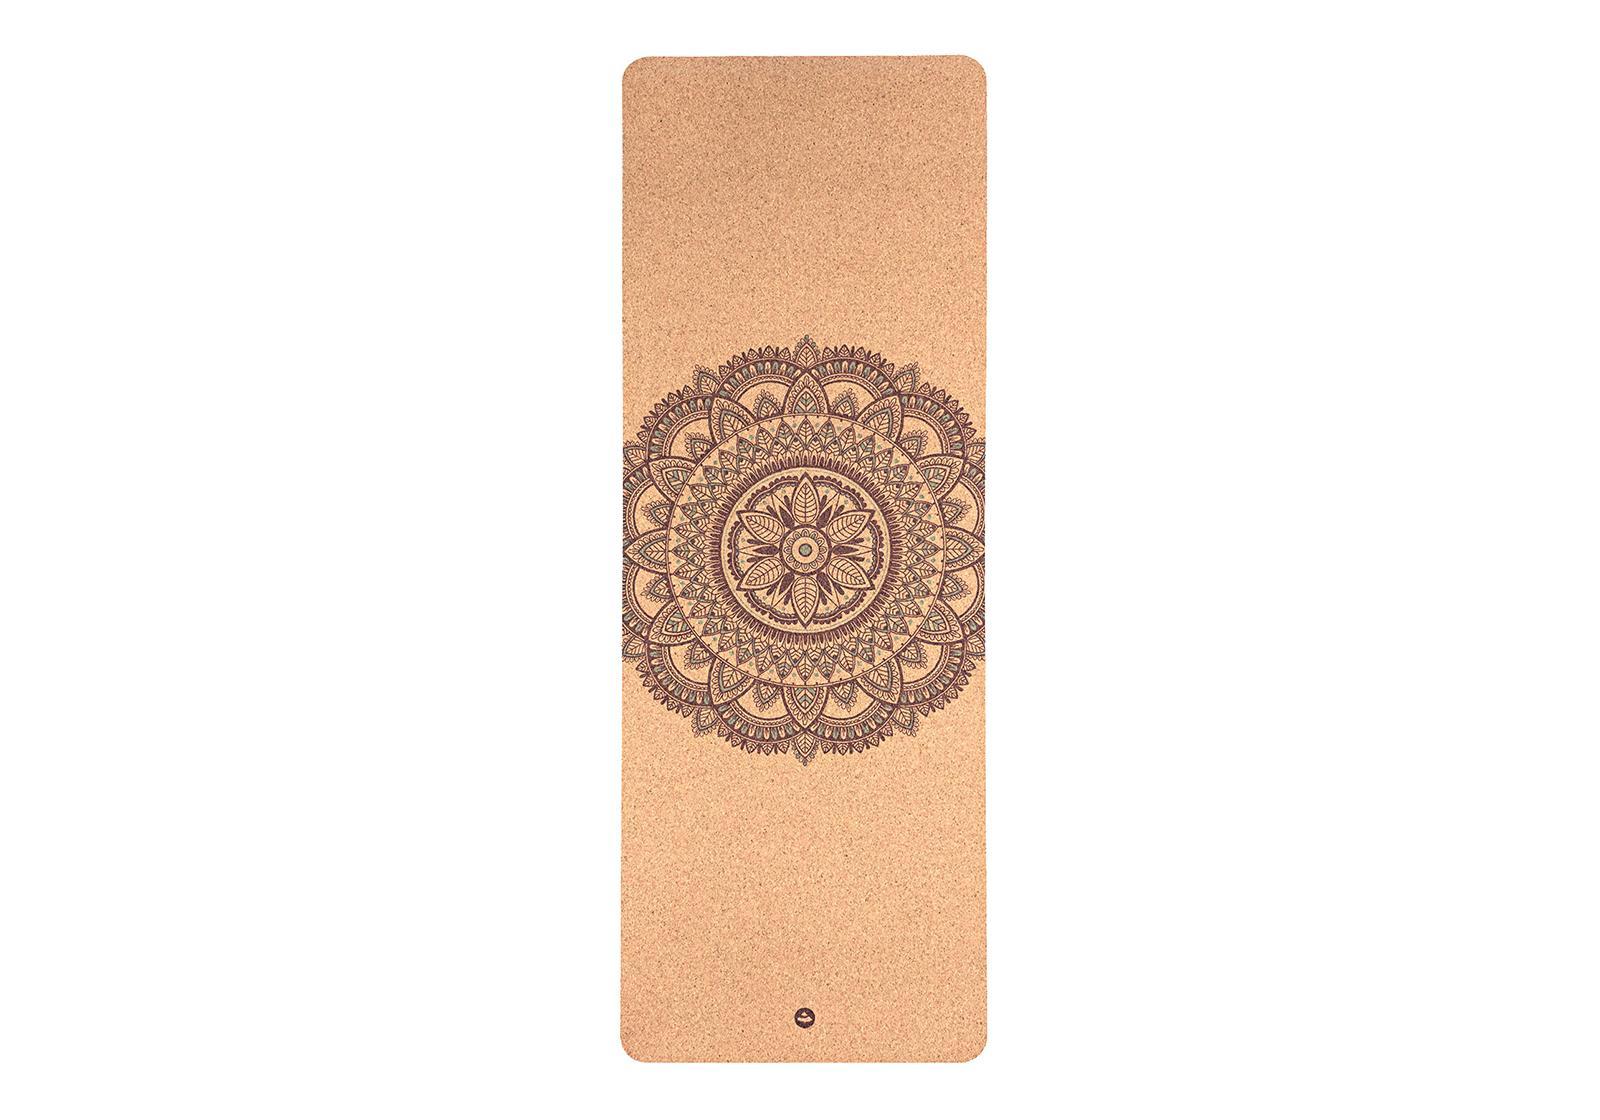 Yoga-mat-Cork_MANDALA-bicolour1.jpg